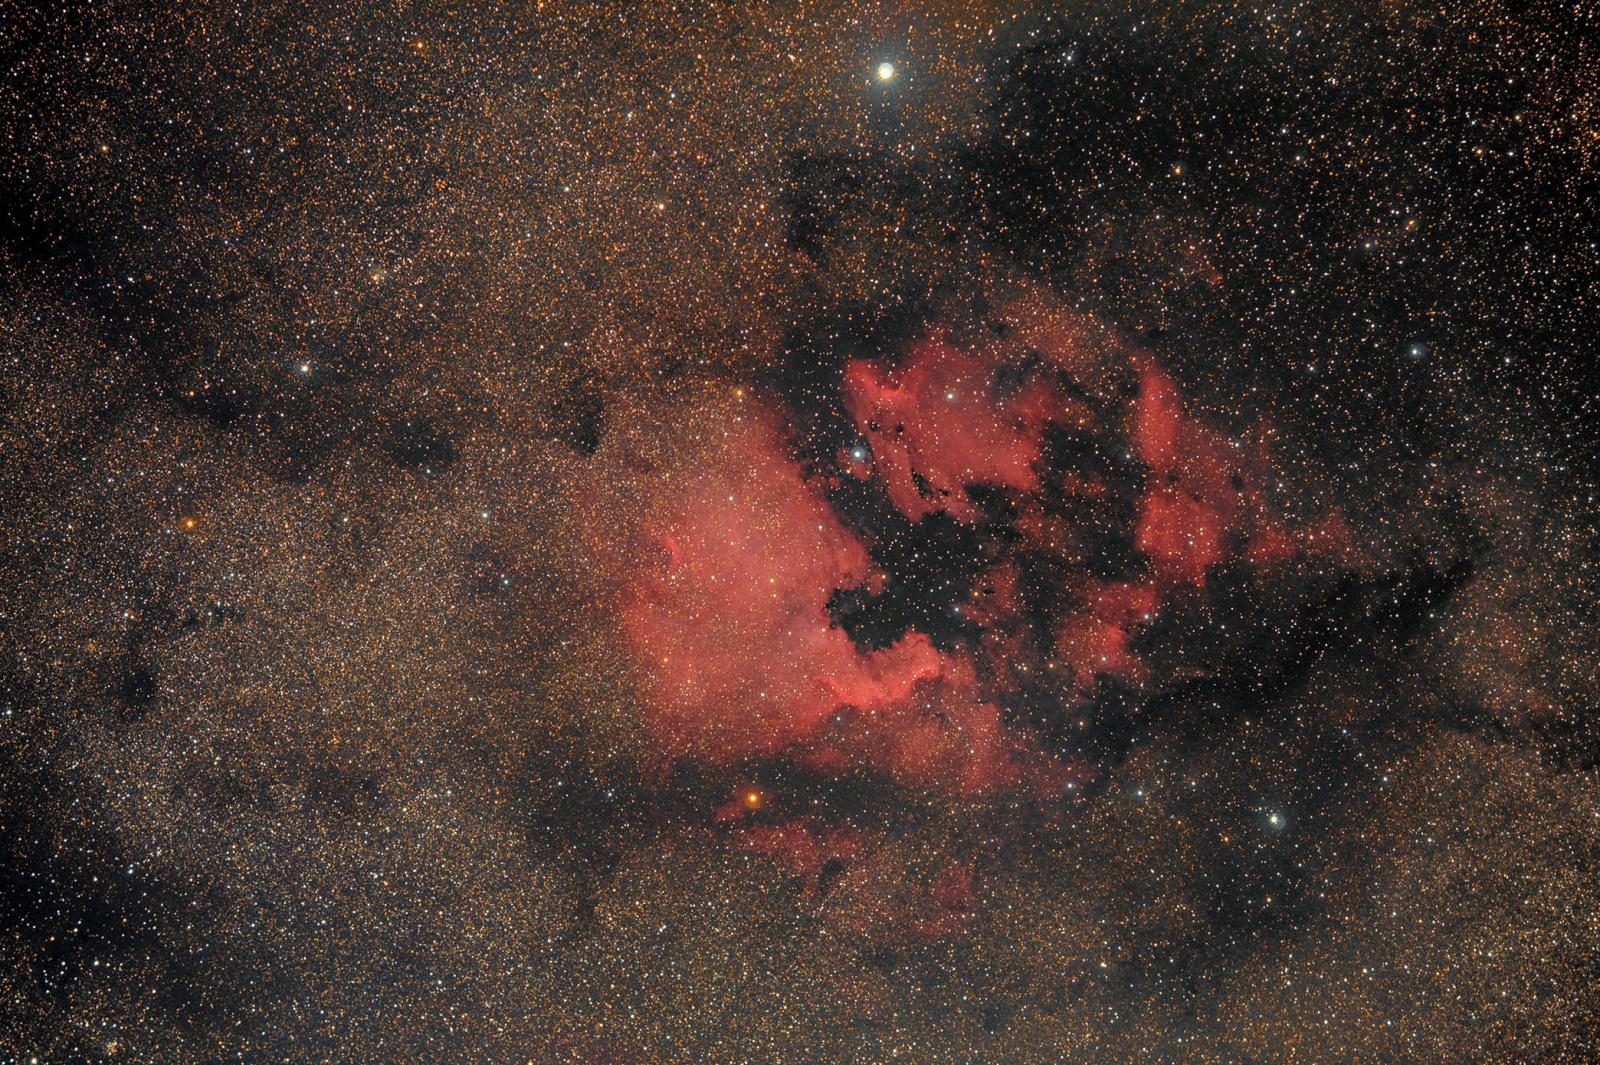 1741704351_NGC700050.thumb.jpg.34c8436b7a2c20ab7a9ea1af4861bf33.jpg